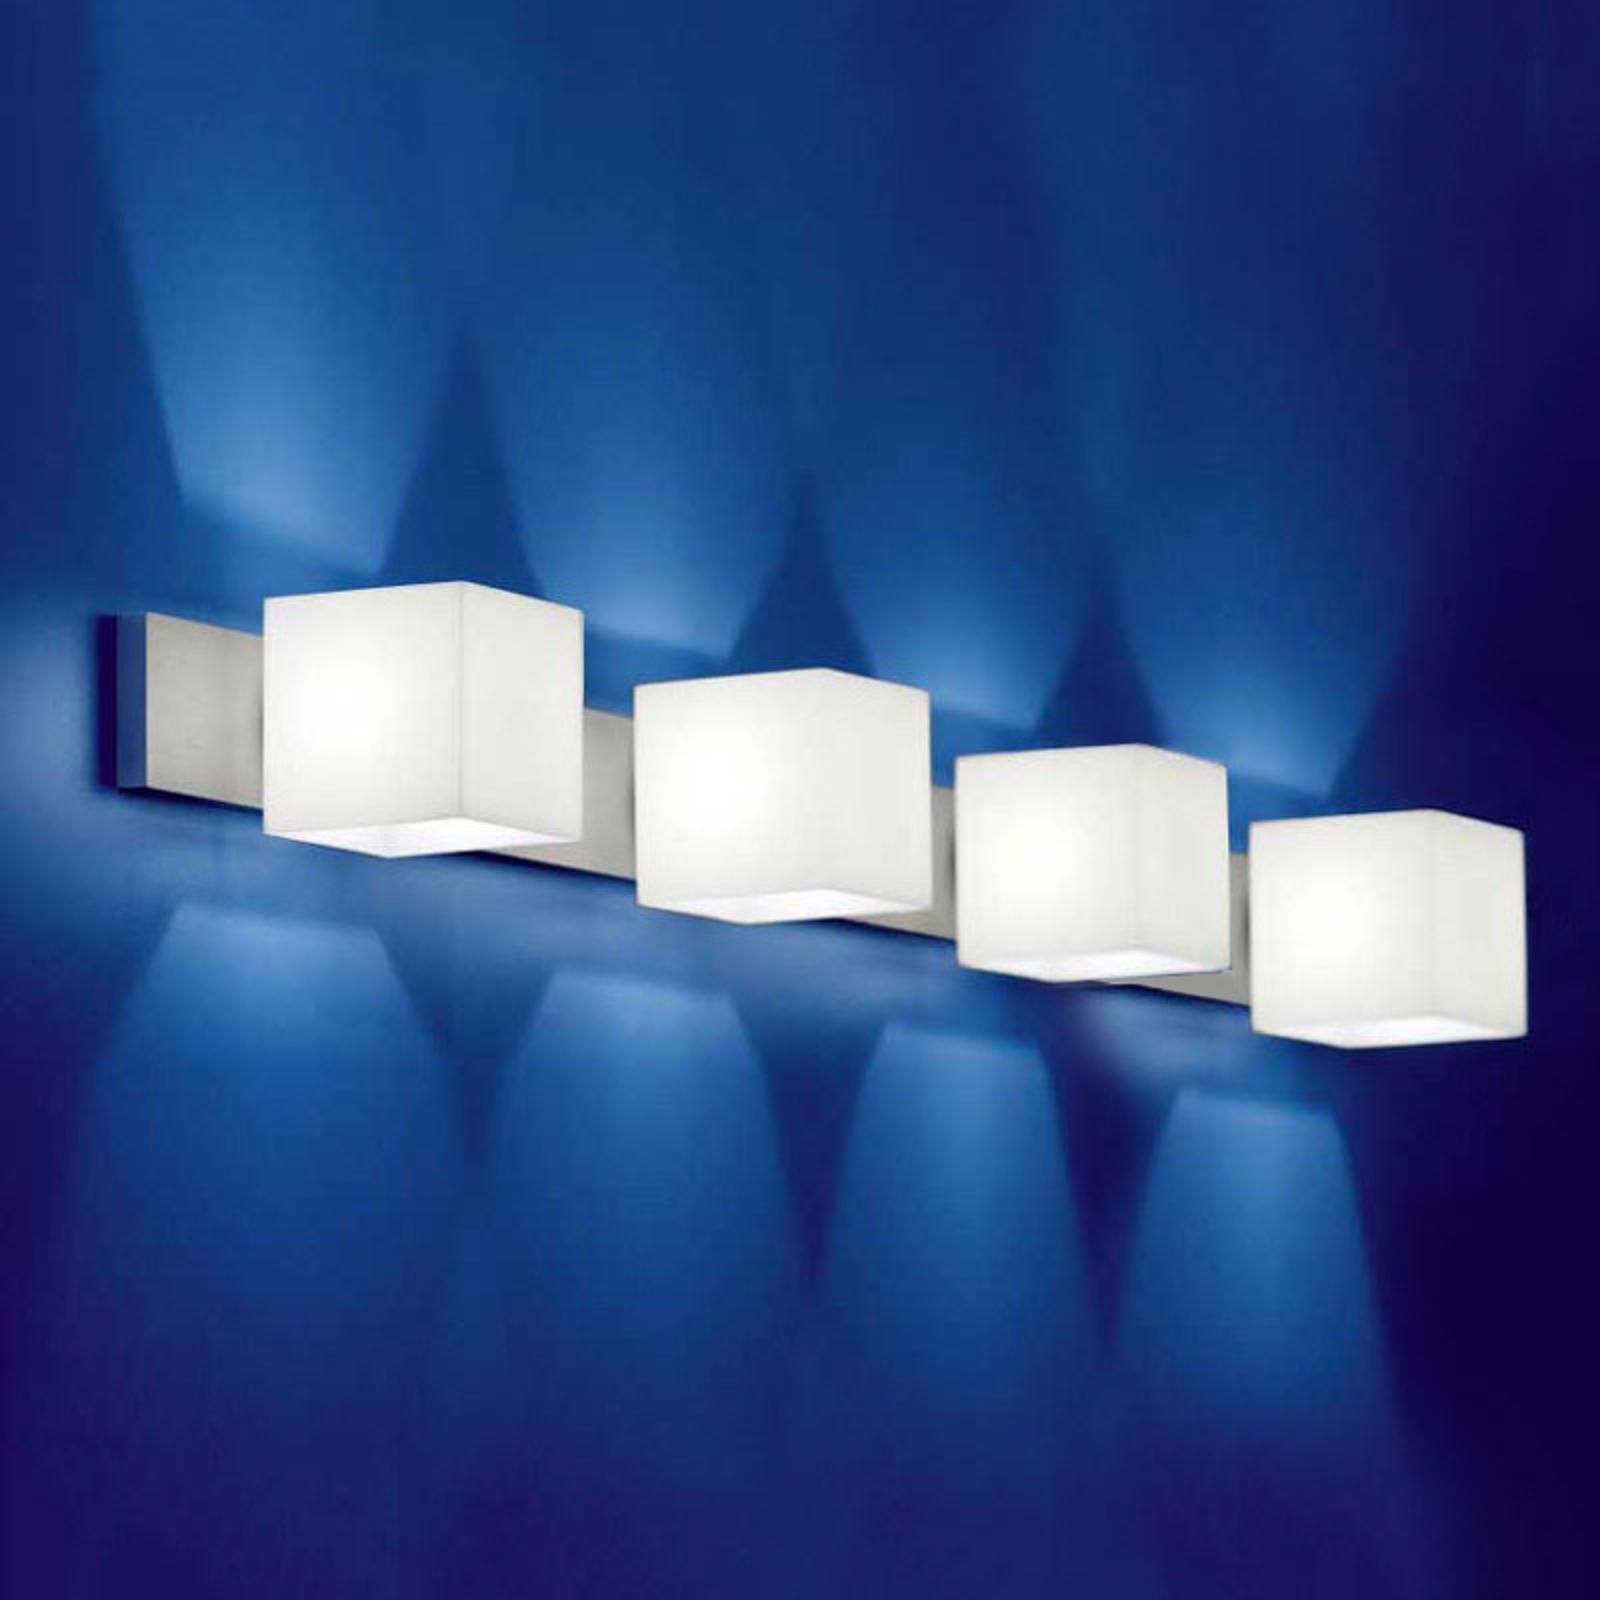 Wandlamp CUBE, 4-lichts met antiverblinding